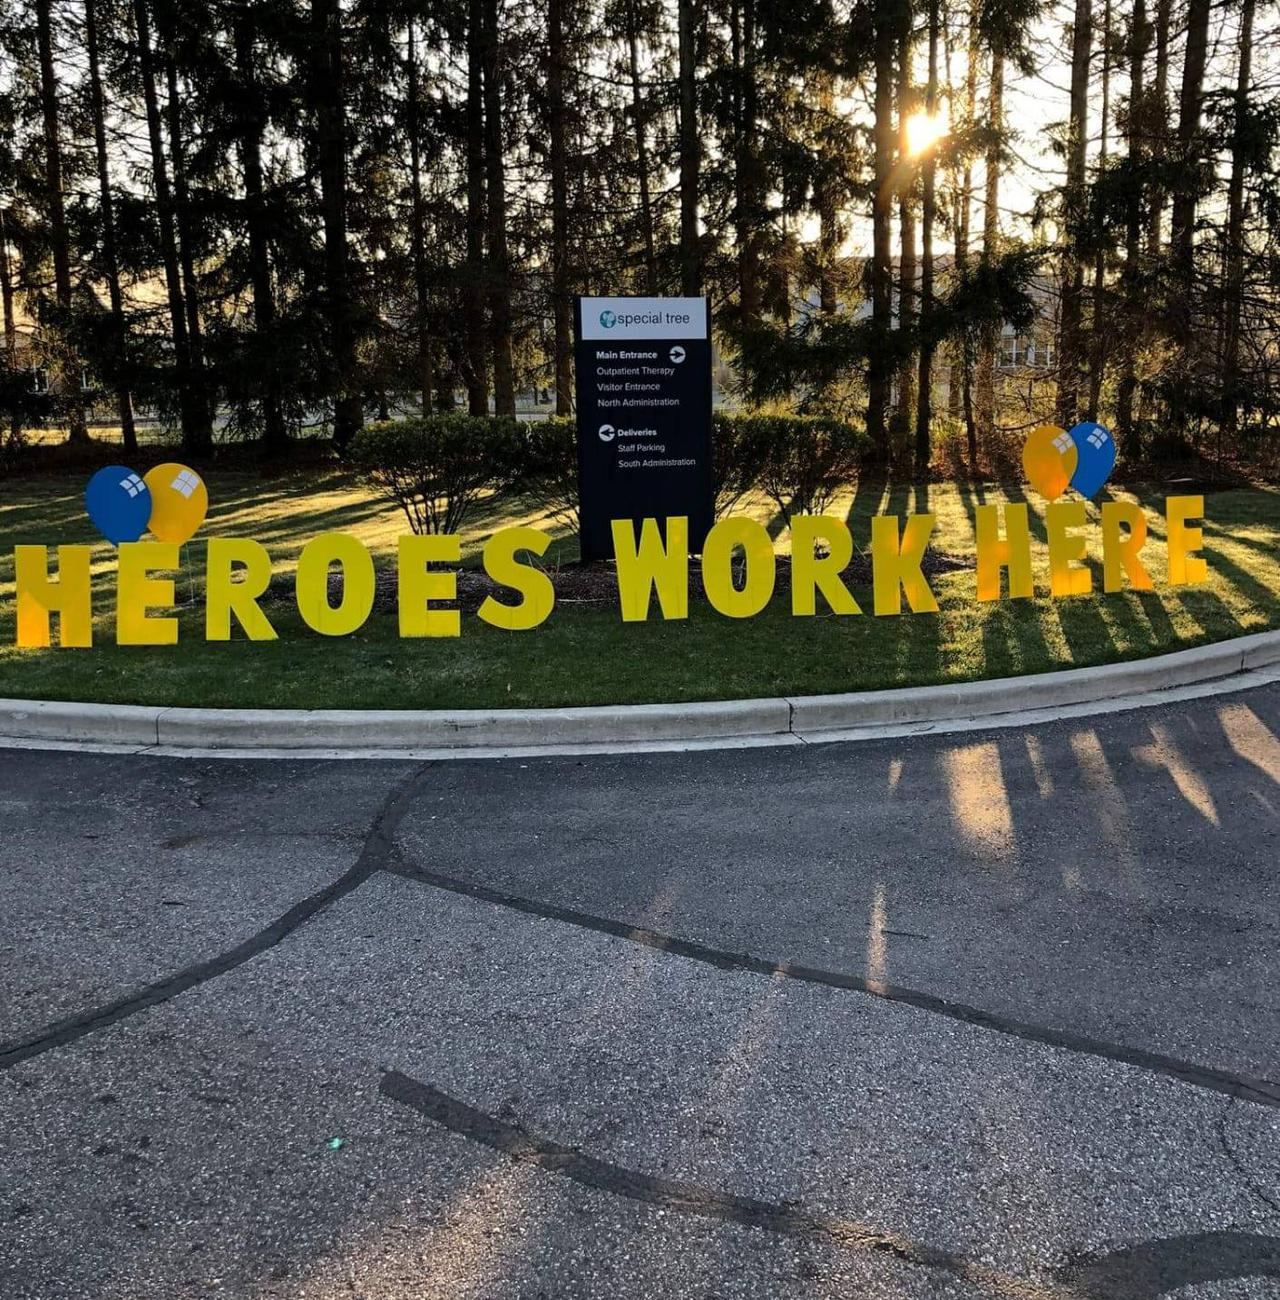 heroes work here custom yard sign decoration